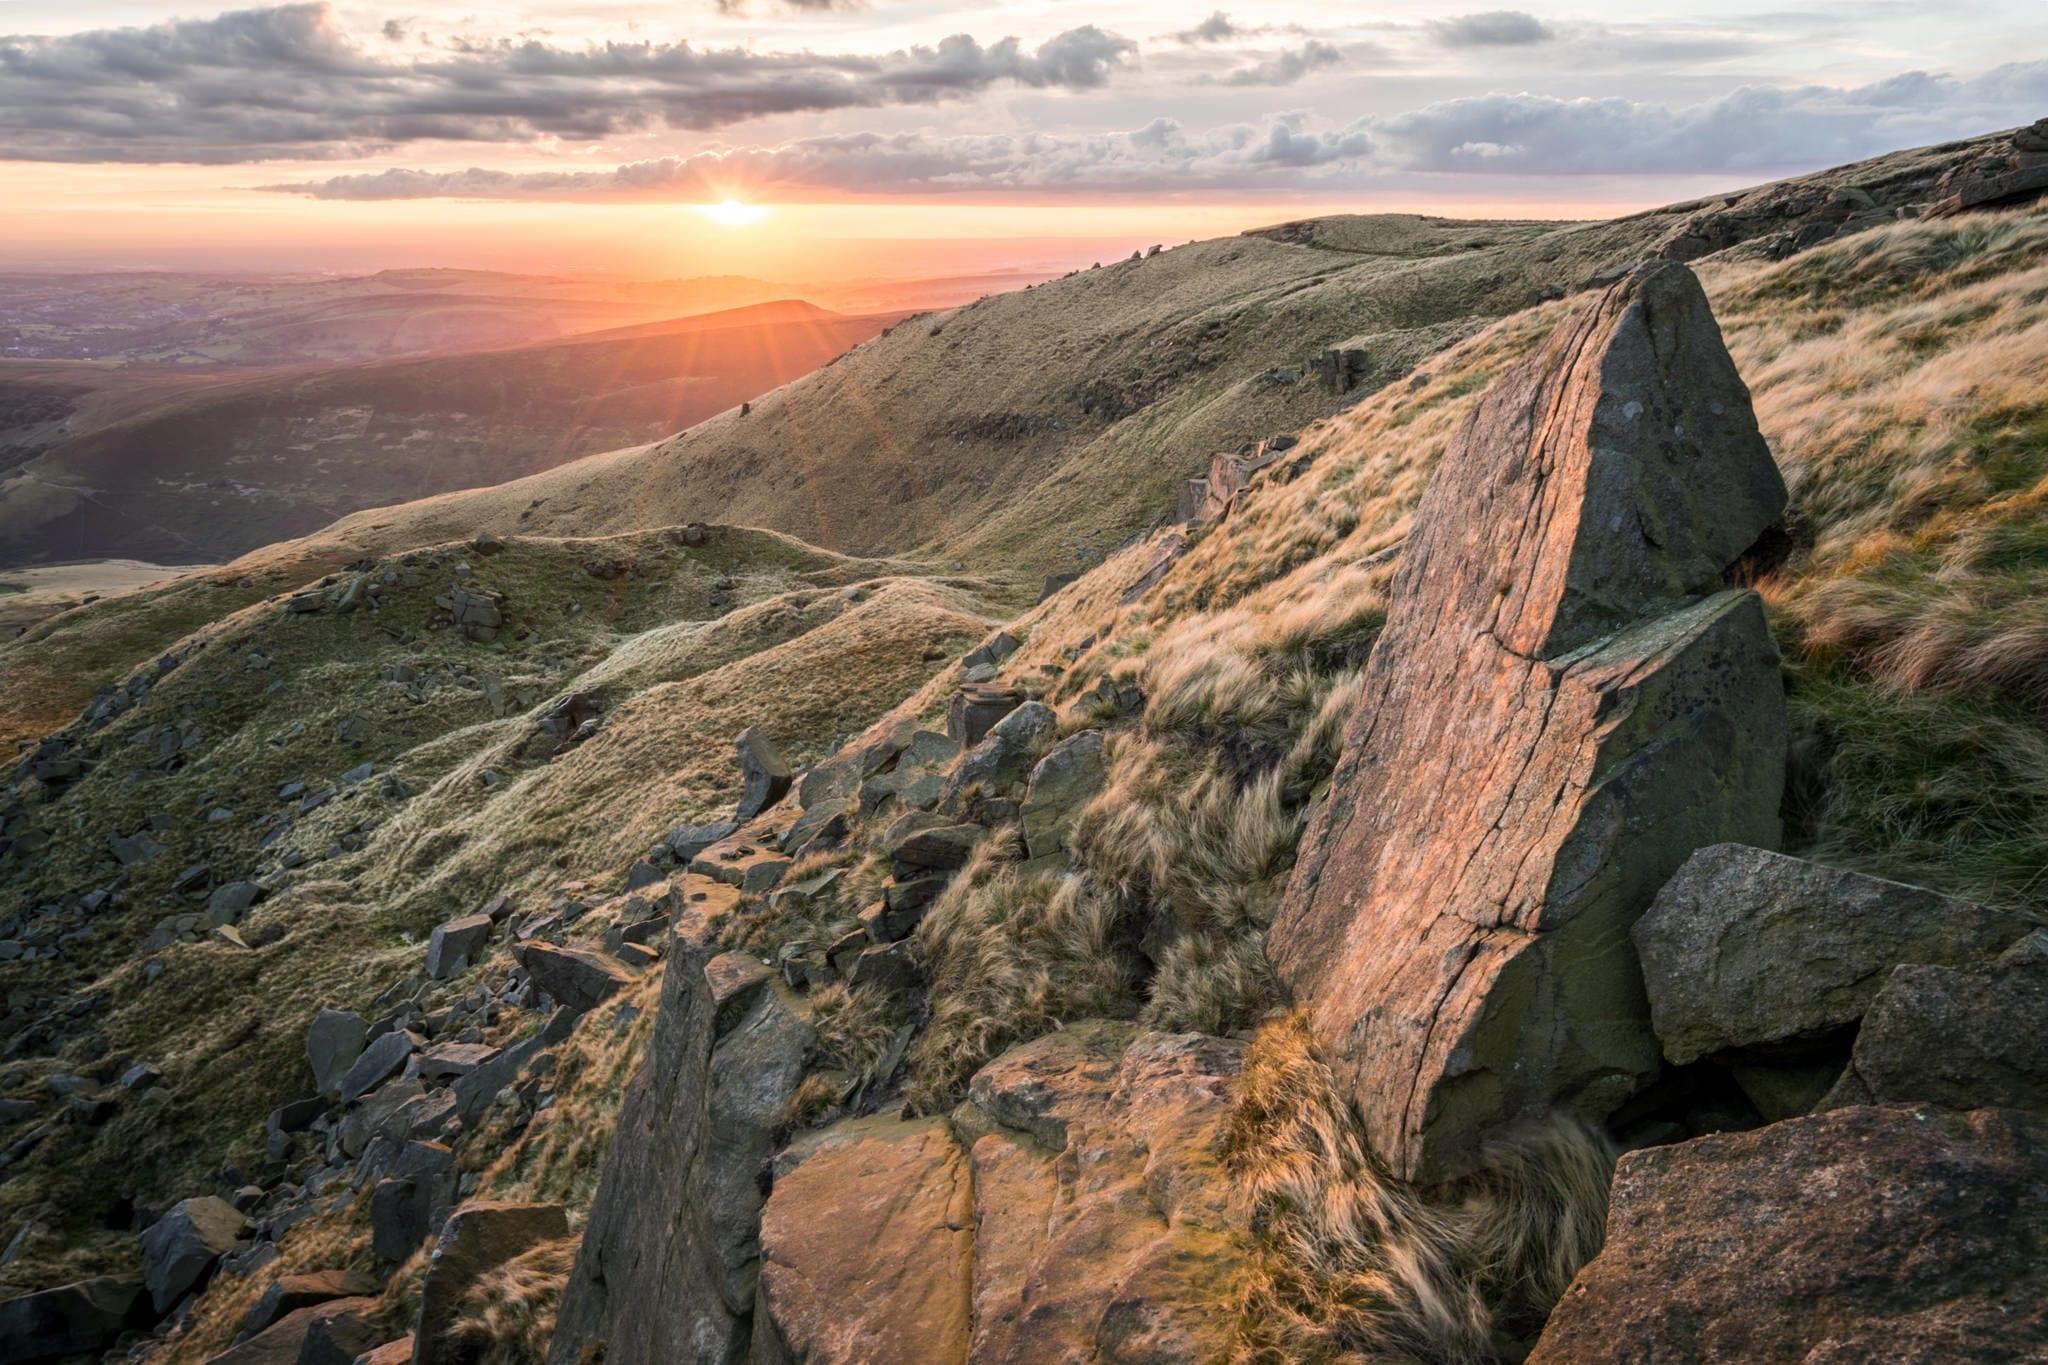 Sandy Heys Autumn Equinox Sunset - Kinder Scout Sunrise to Sunset Workshop